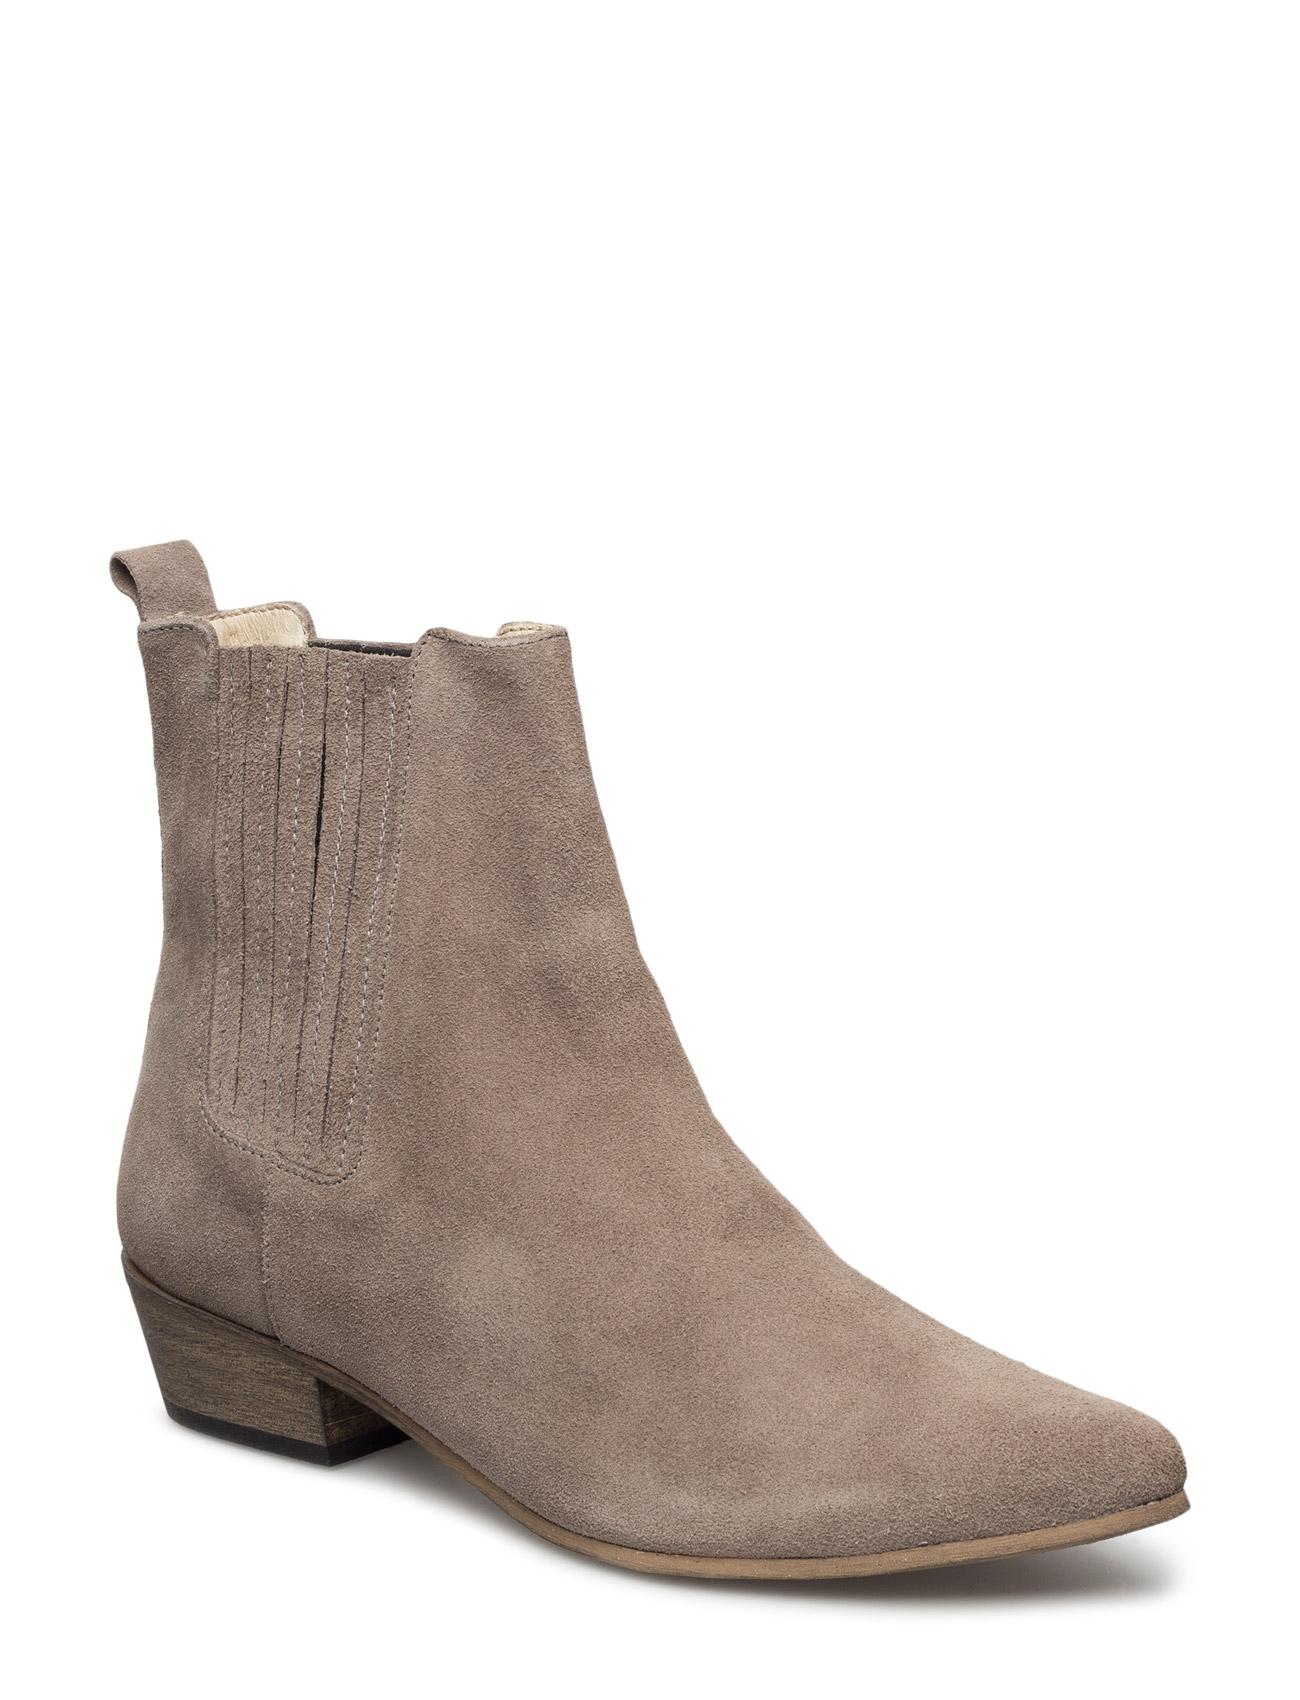 Bailey Ivylee Copenhagen Støvler til Kvinder i Taupe